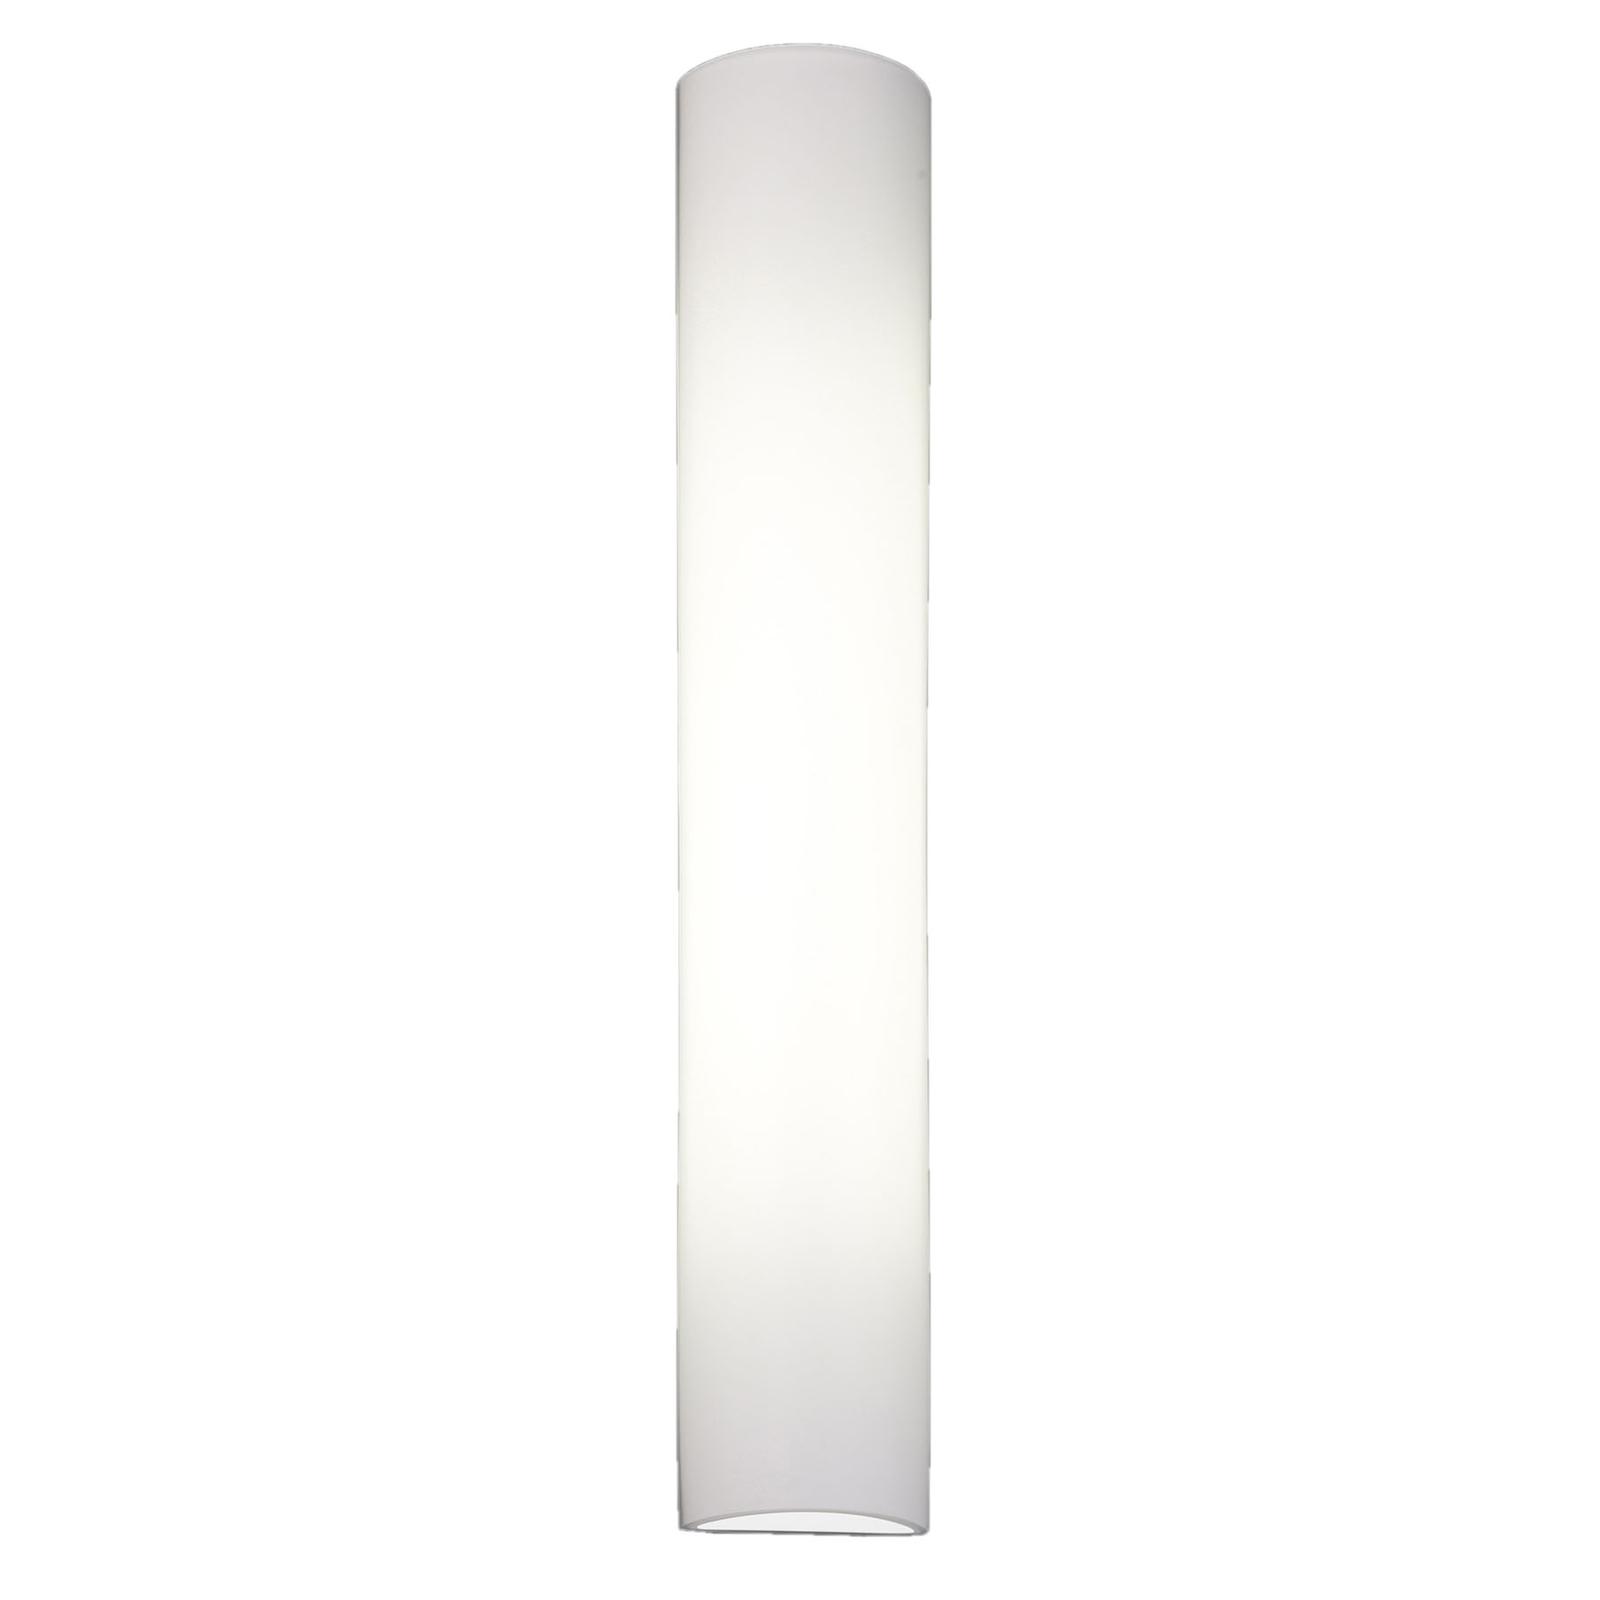 BANKAMP Cromo LED-Wandleuchte aus Glas, Höhe 54cm